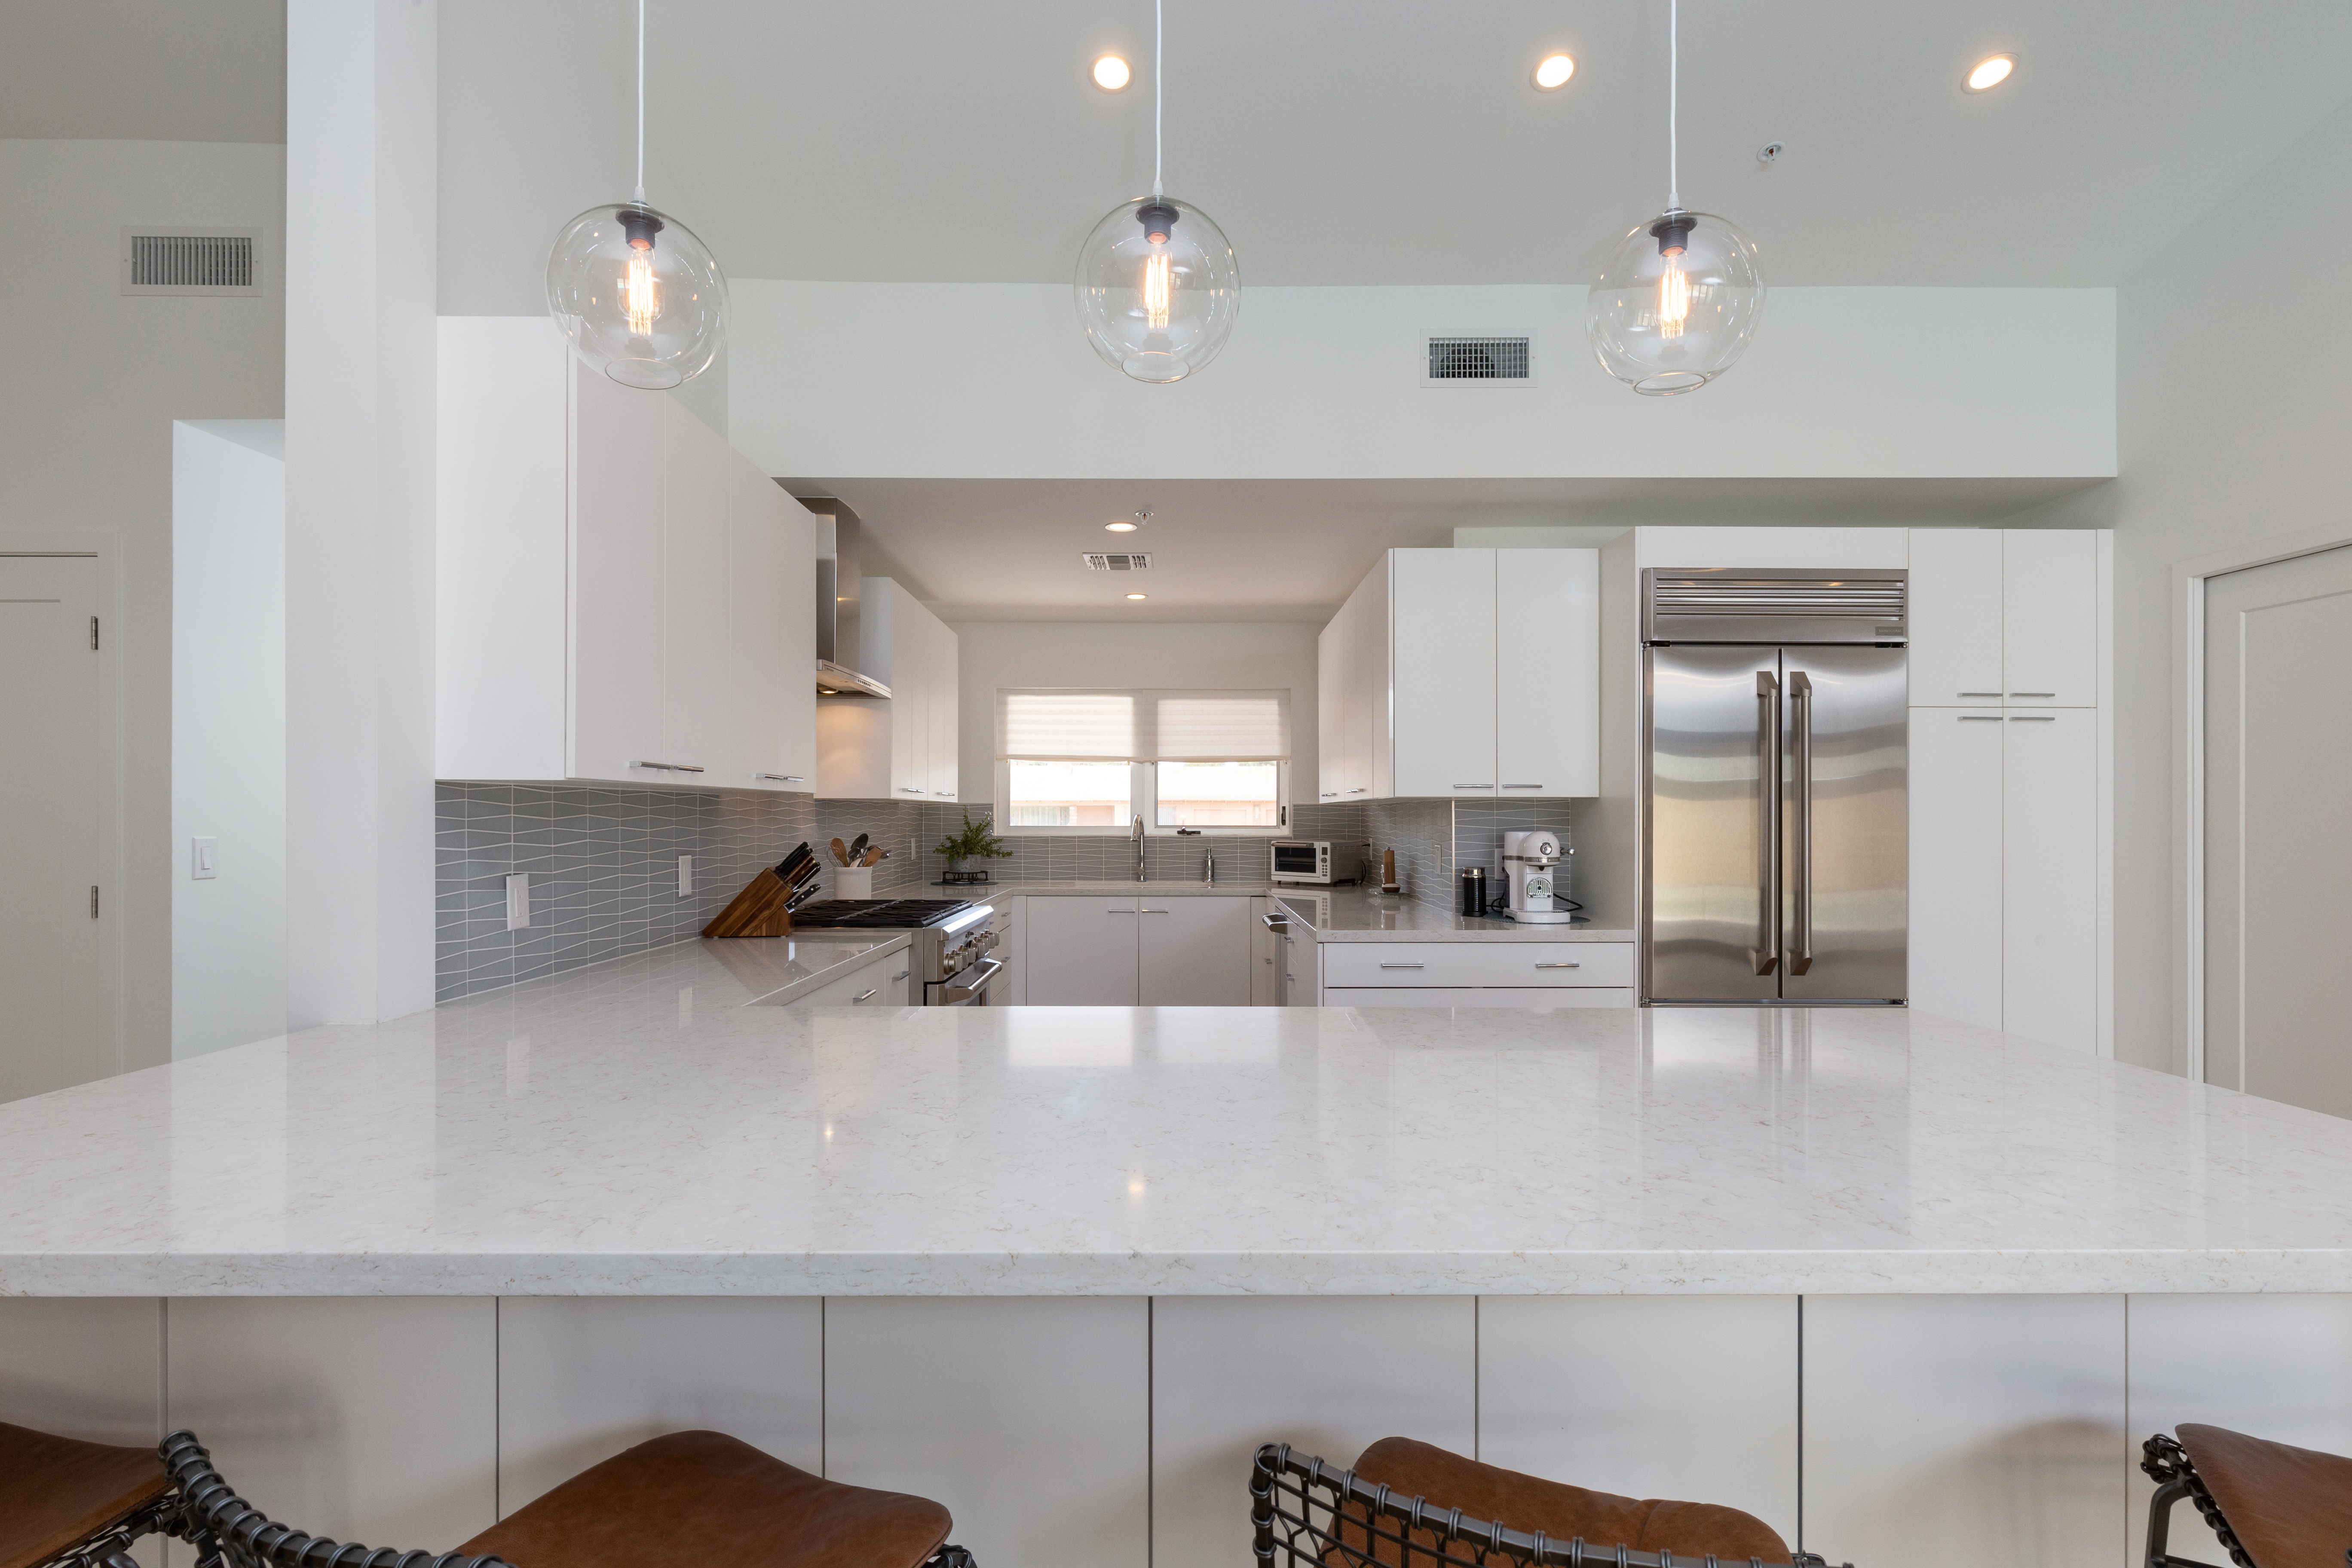 Kitchen Remodel Contractor in Scottsdale